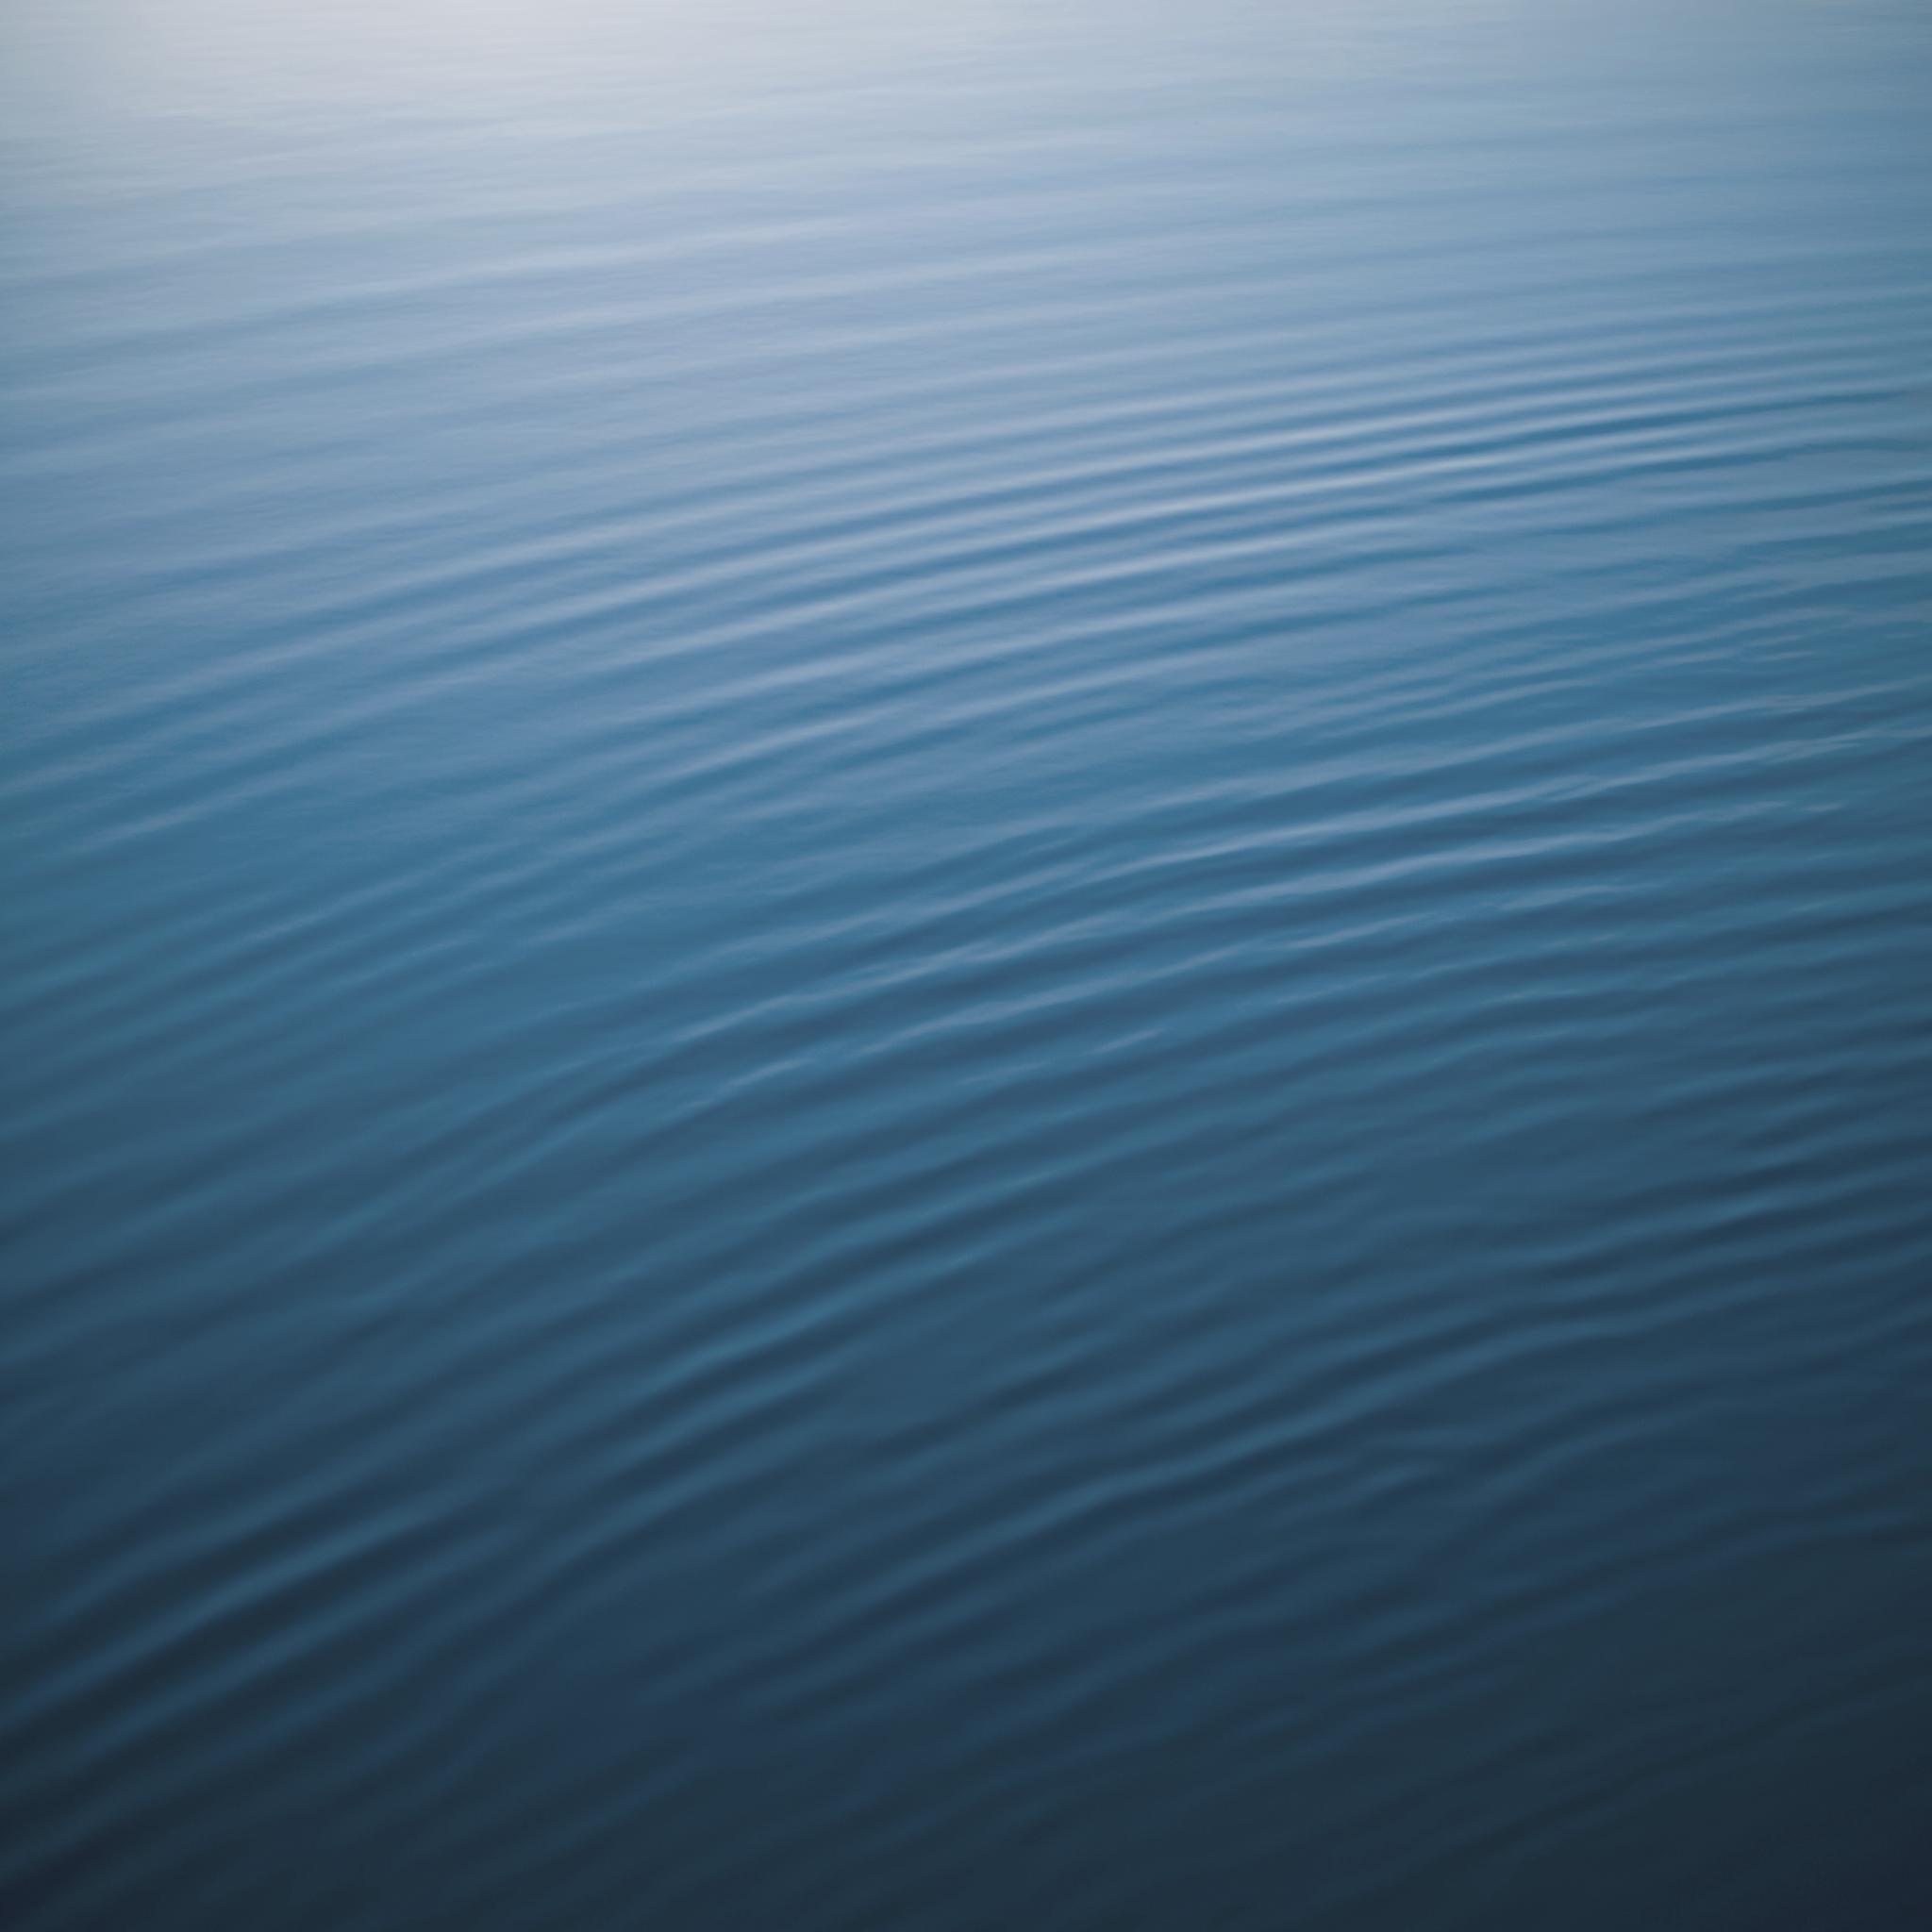 iOS 6 Wallpaper OS X Developer 2048x2048